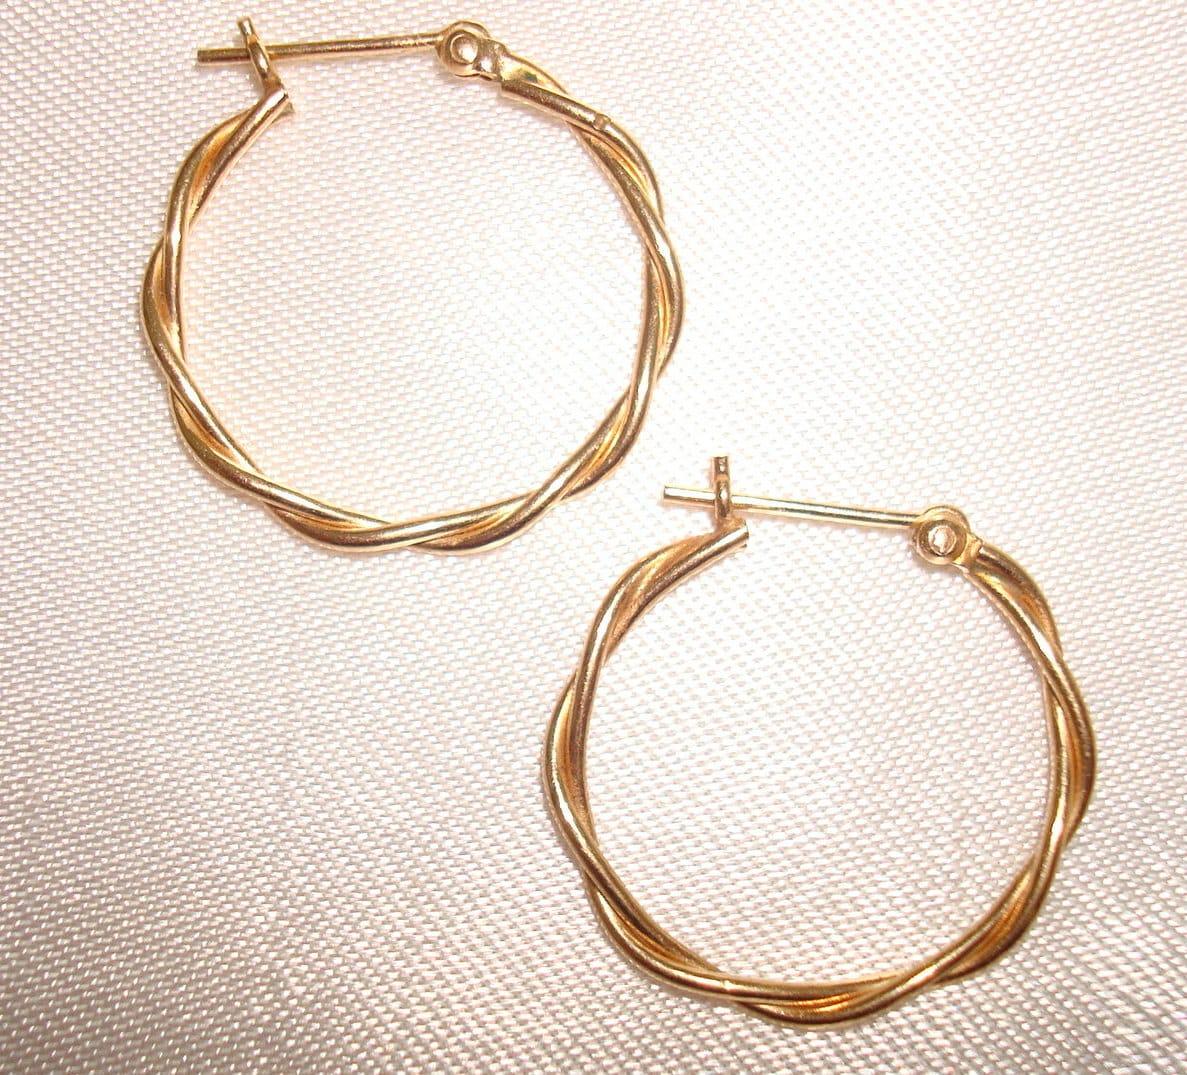 14k gold double wire twisted hoop earrings pierced ear gold. Black Bedroom Furniture Sets. Home Design Ideas